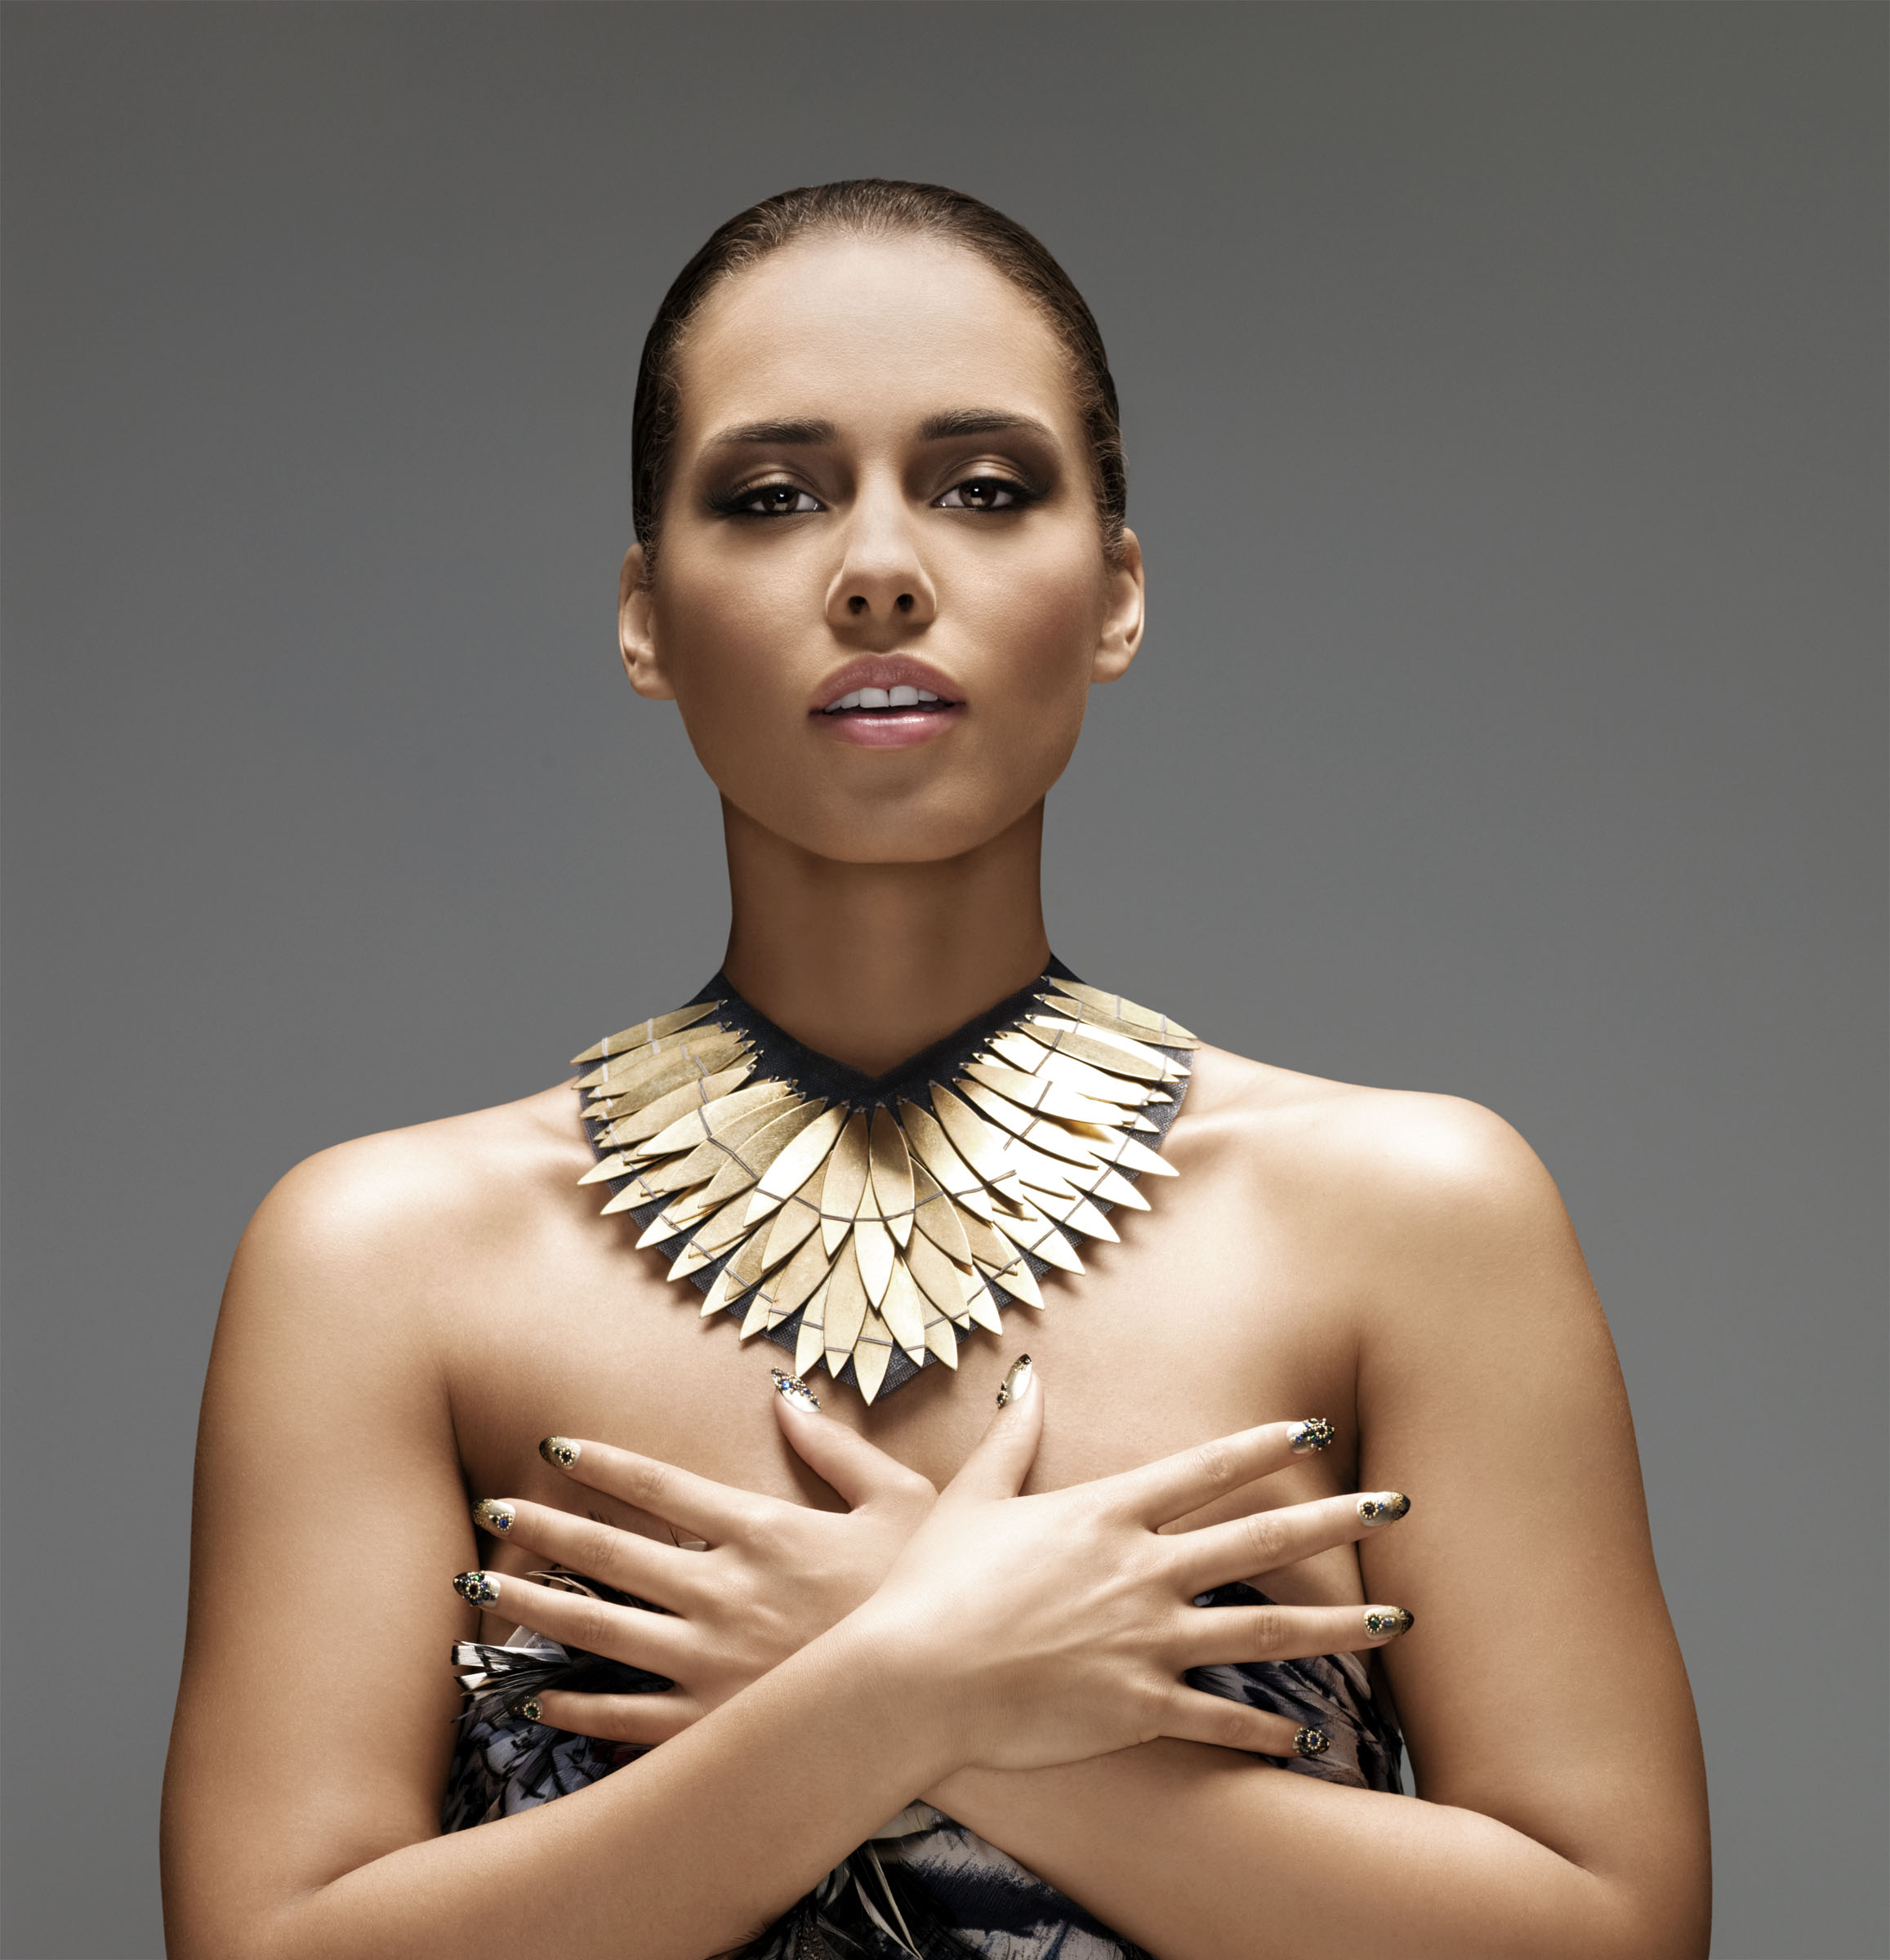 Happy Birthday For Alicia Keys, Who Turns 29 Today